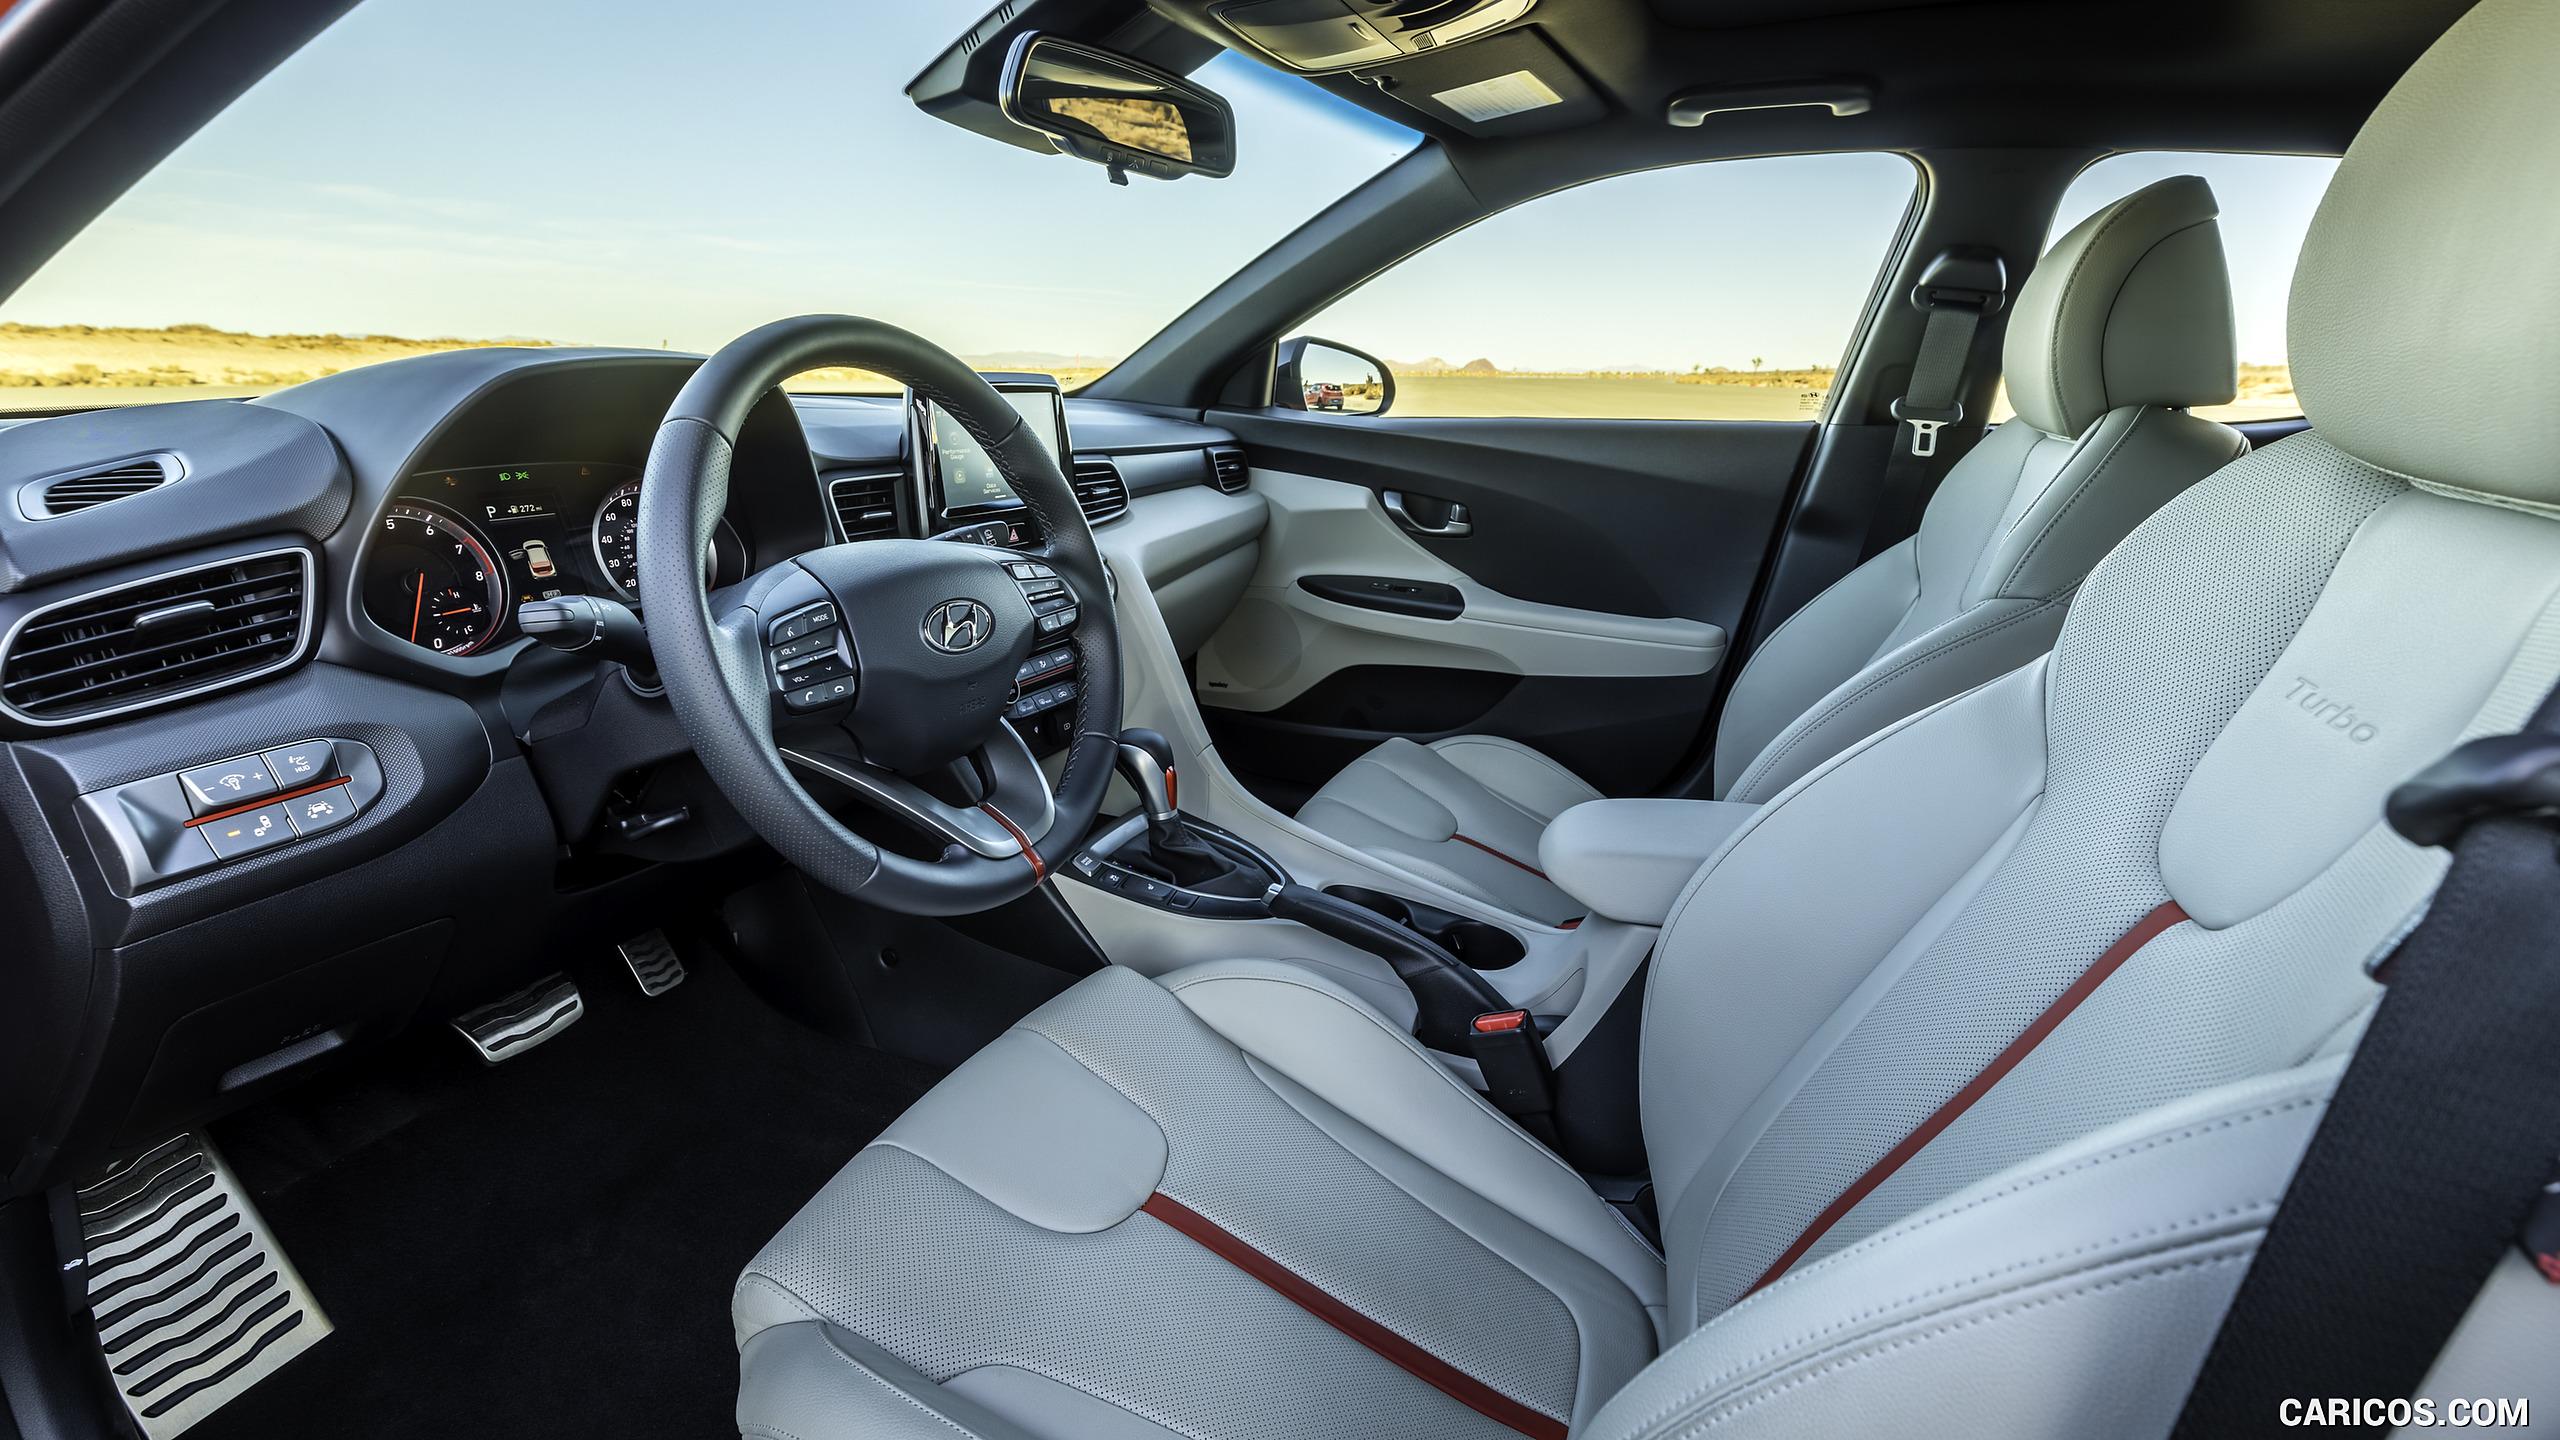 2019 Hyundai Veloster Turbo   Interior HD Wallpaper 41 2560x1440